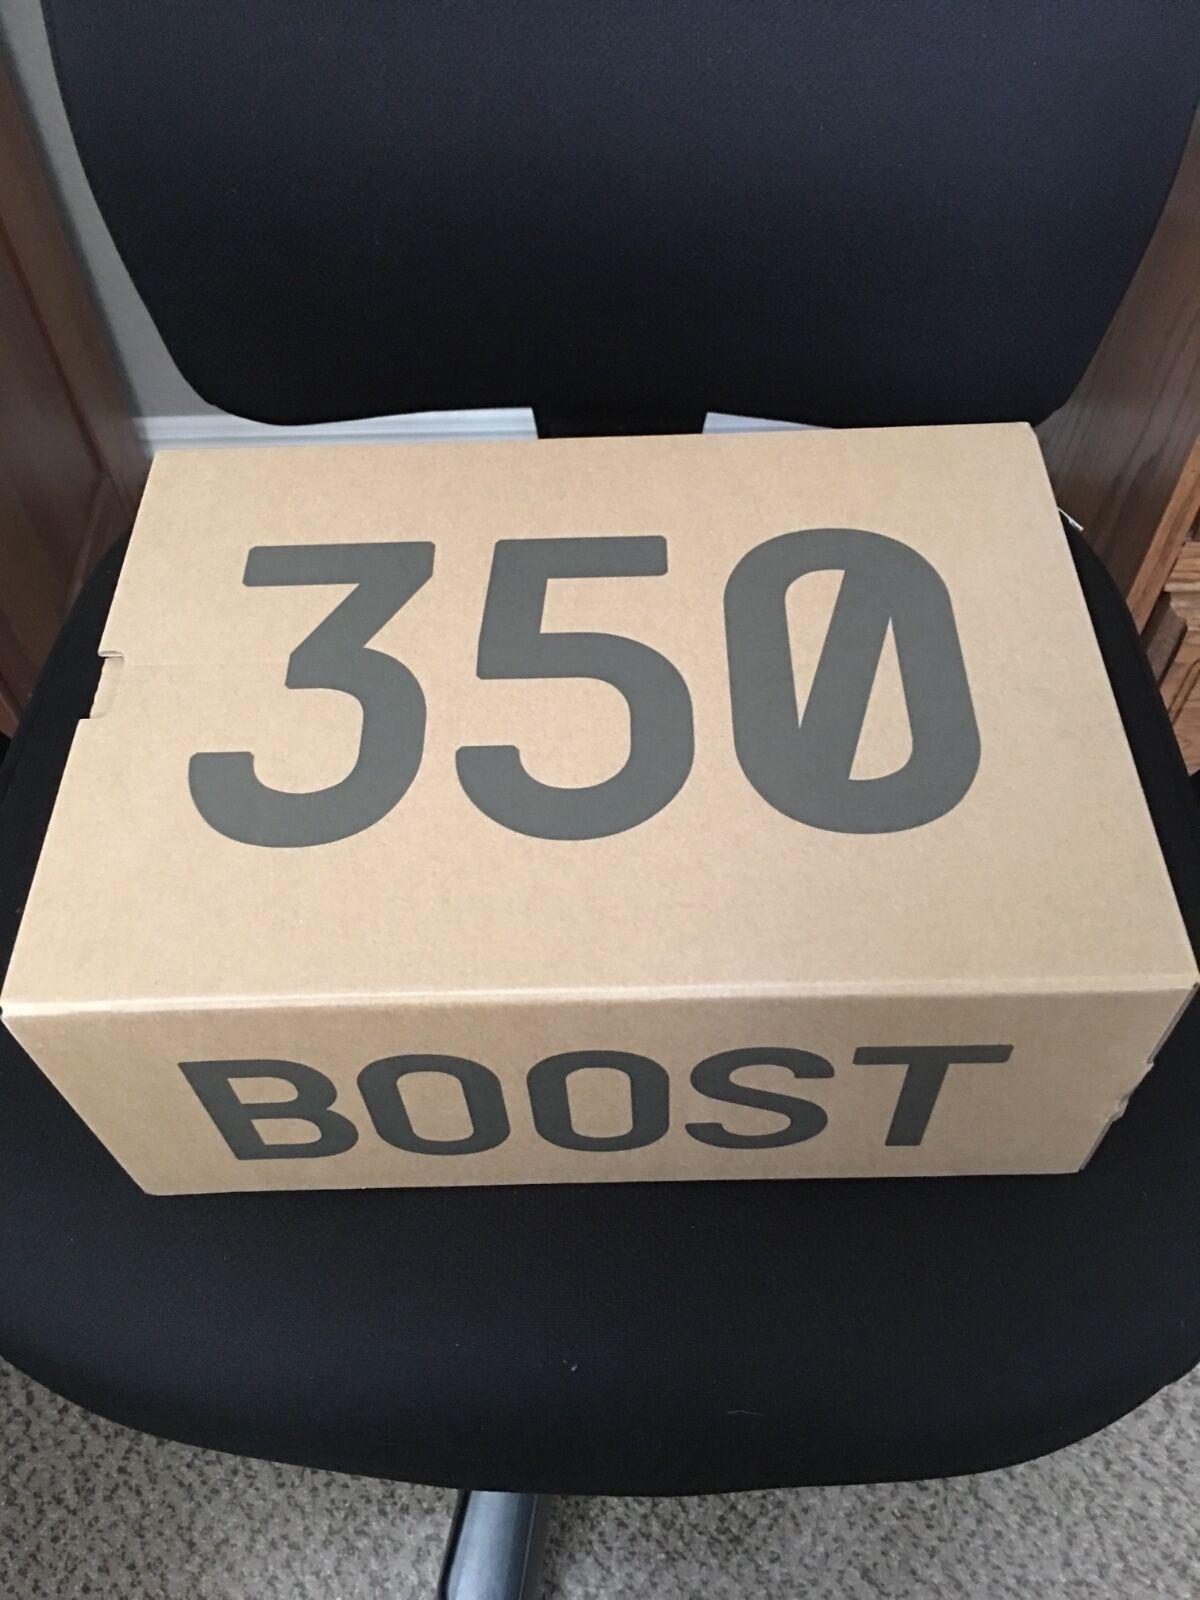 Adidas Yeezy Boost 350 V2 Zebra Size 9 Men's DS